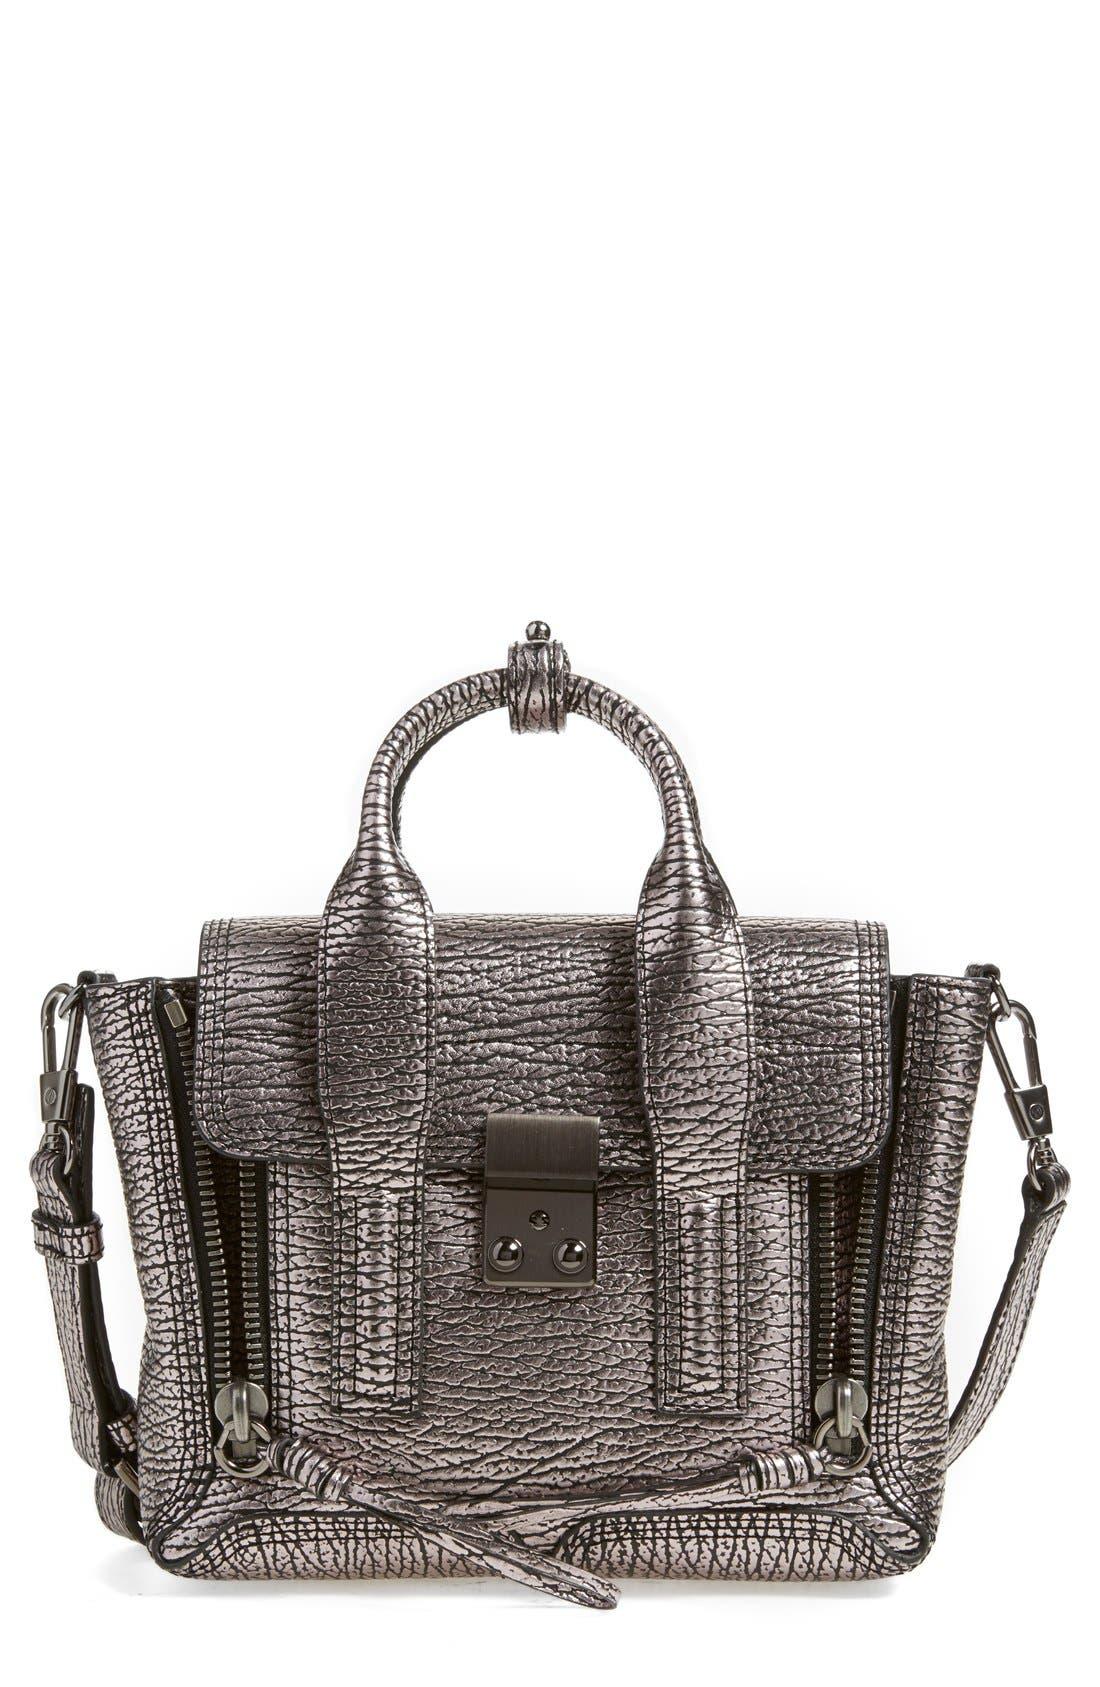 Alternate Image 1 Selected - 3.1 Phillip Lim 'Mini Pashli' Metallic Leather Satchel